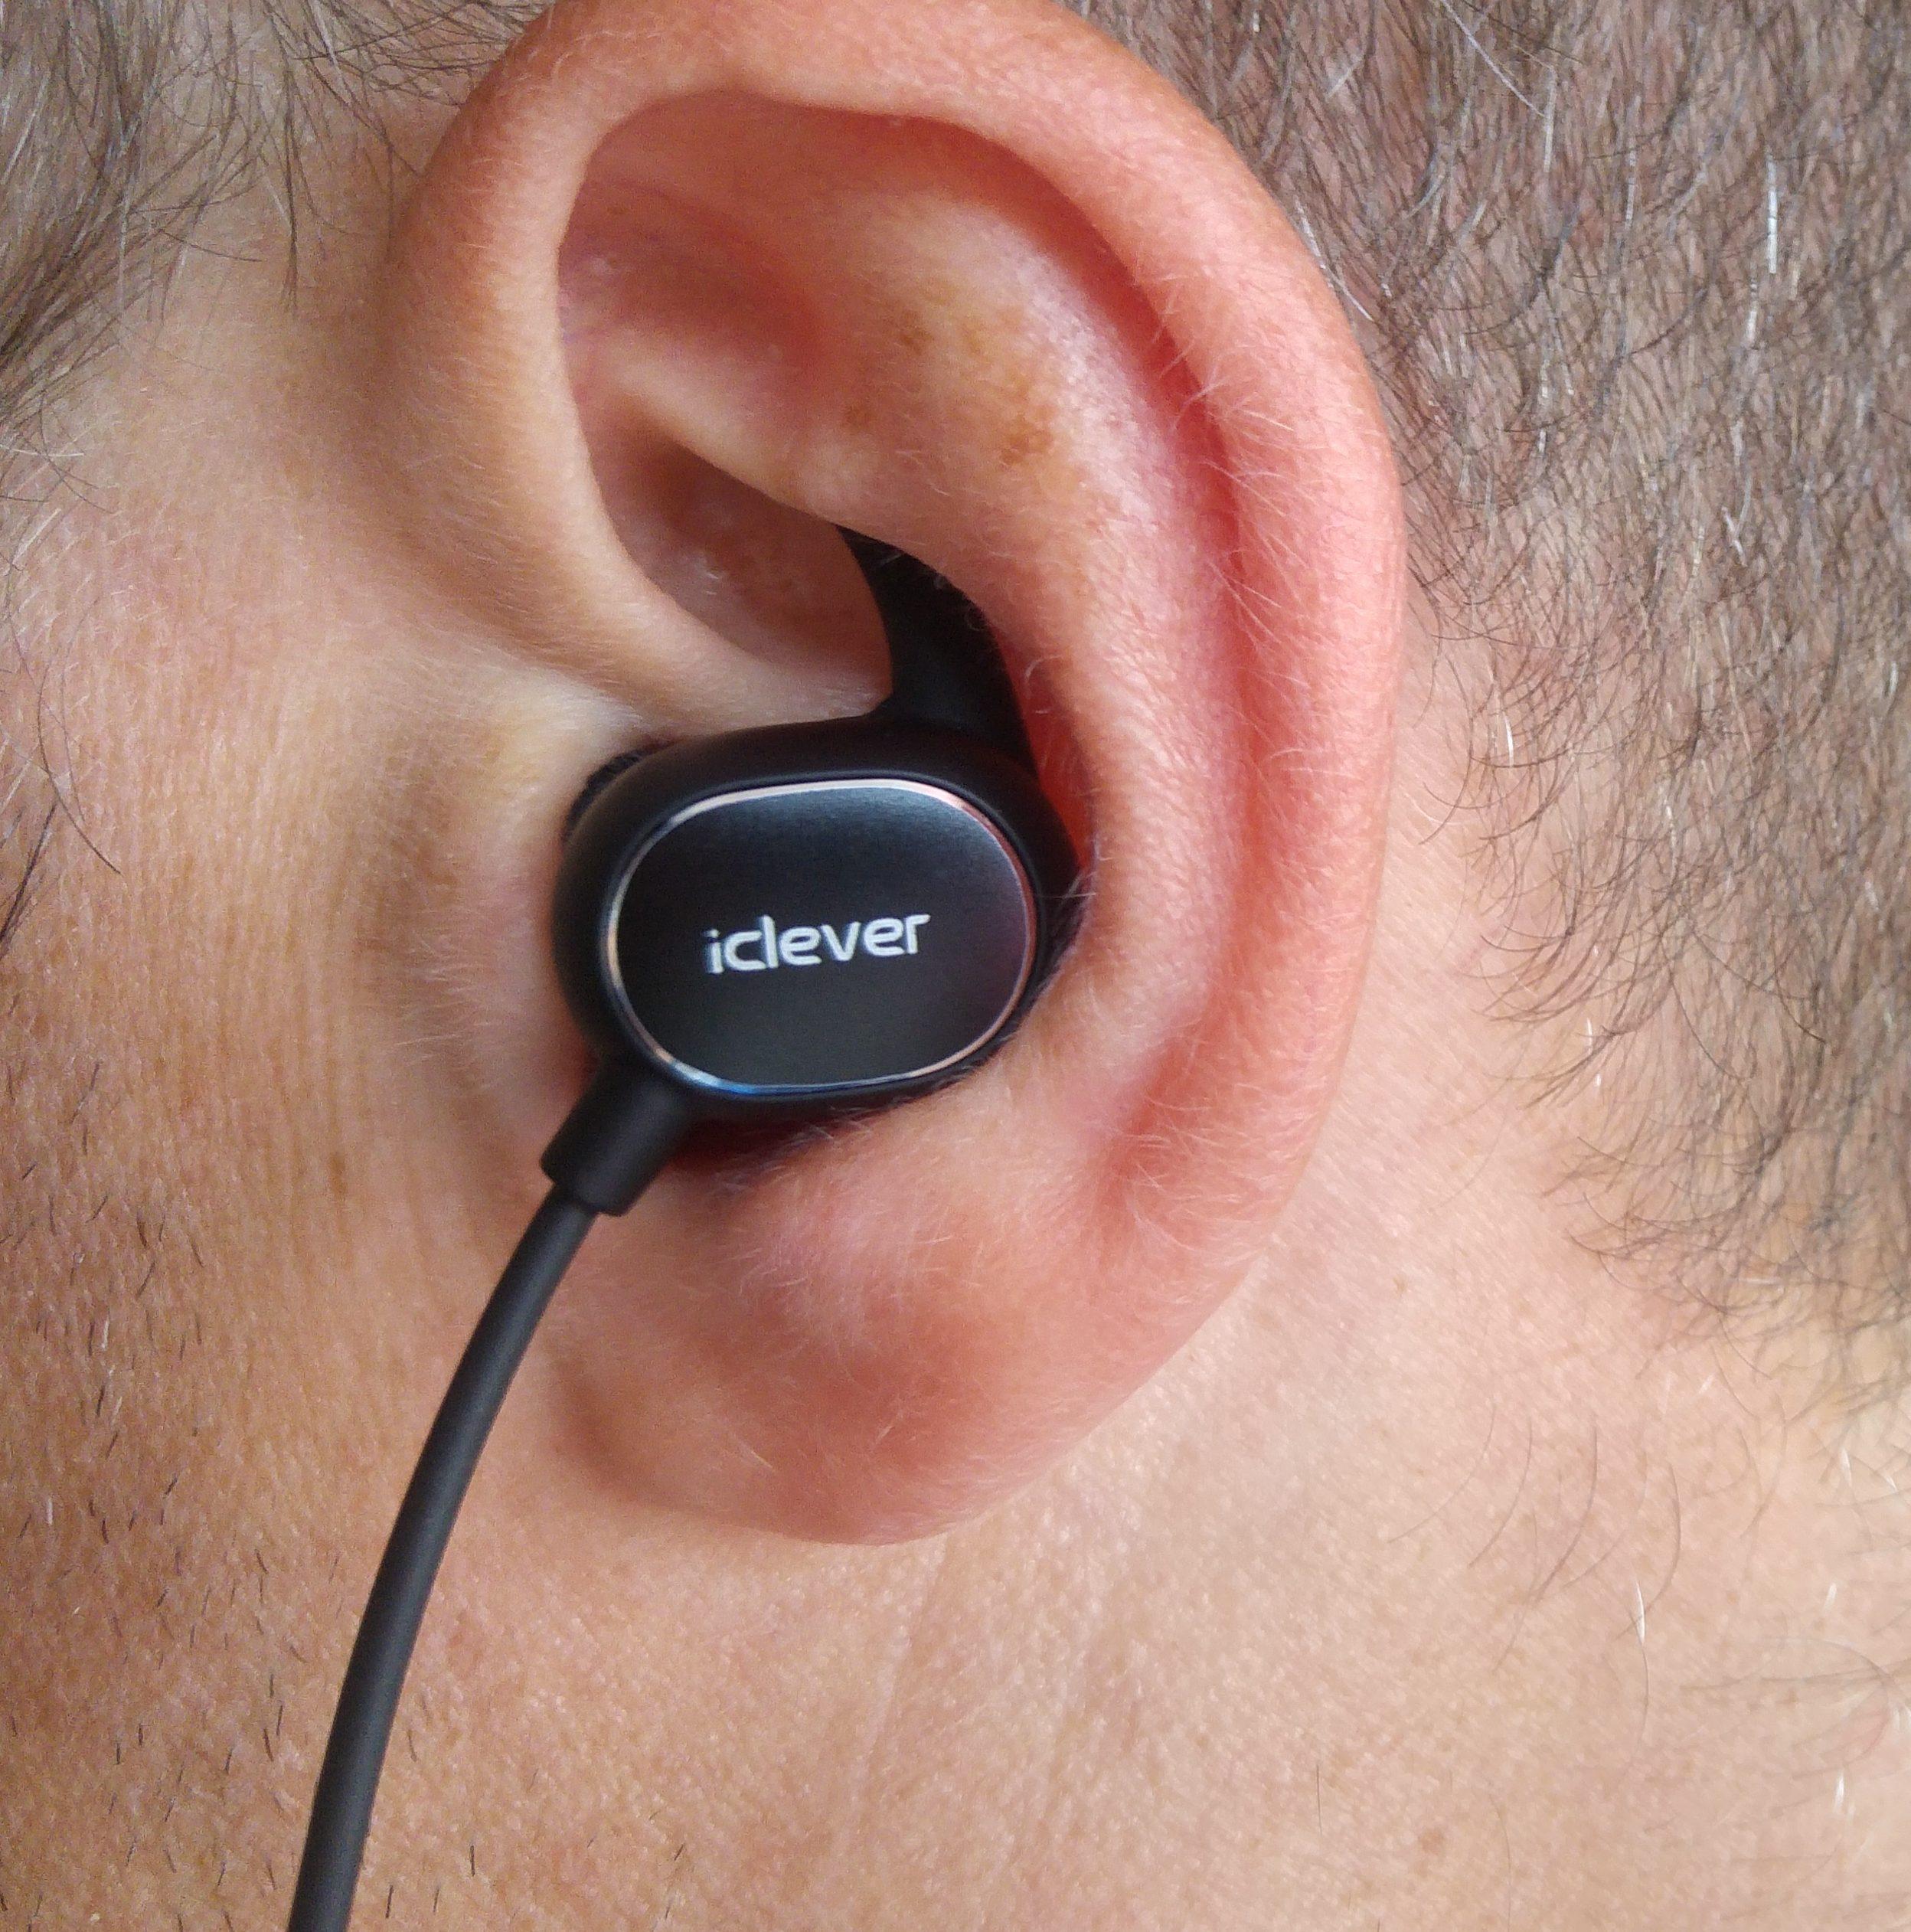 iclever boostrun bth06 bluetooth headphones review. Black Bedroom Furniture Sets. Home Design Ideas